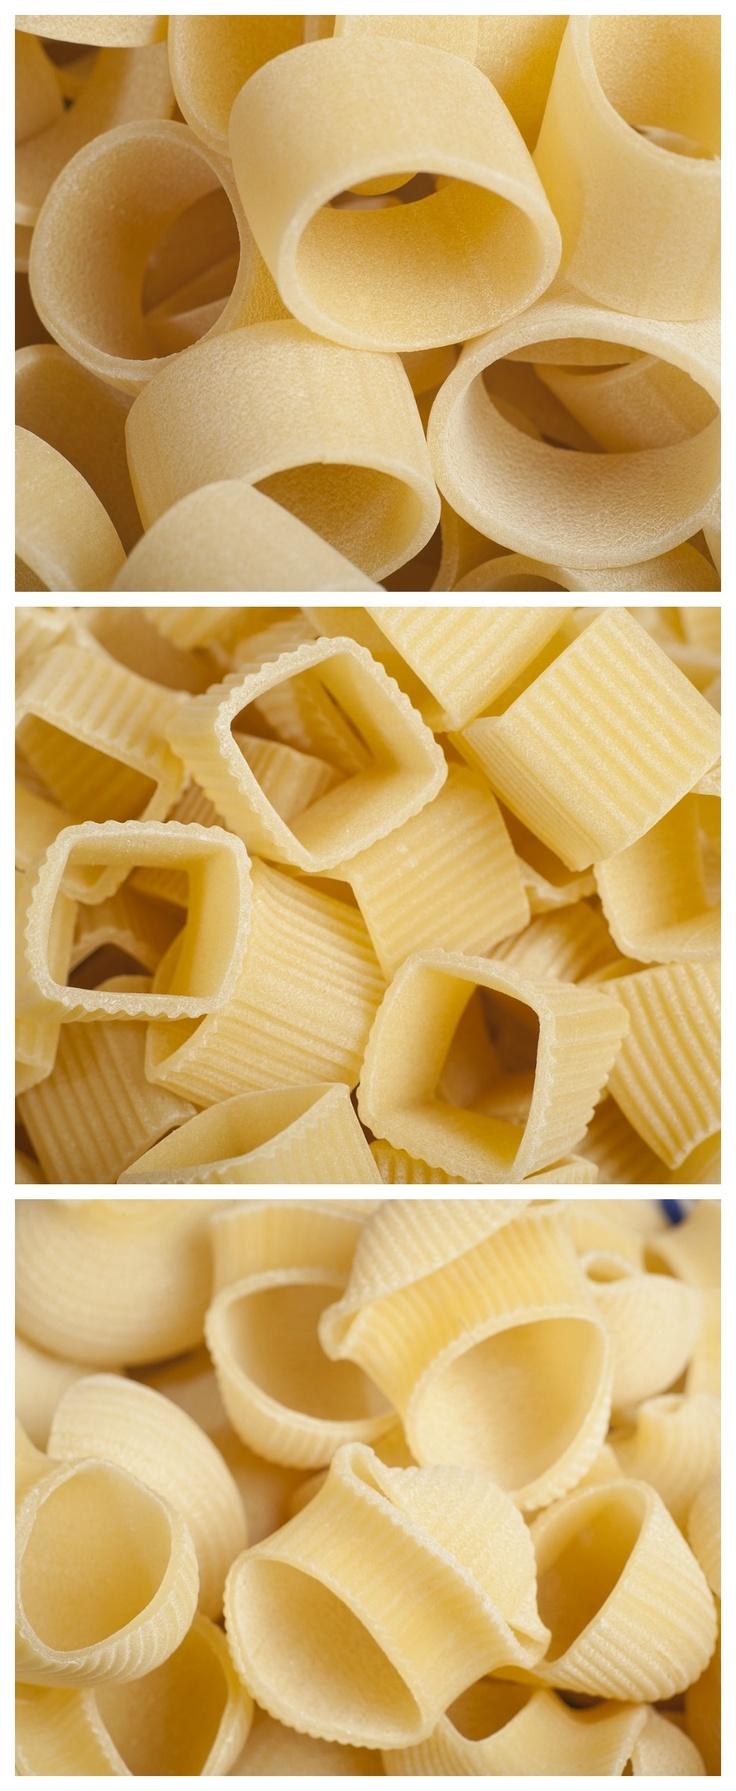 Short Pasta Shapes #shortpasta   when Quality is Passion   Pinterest